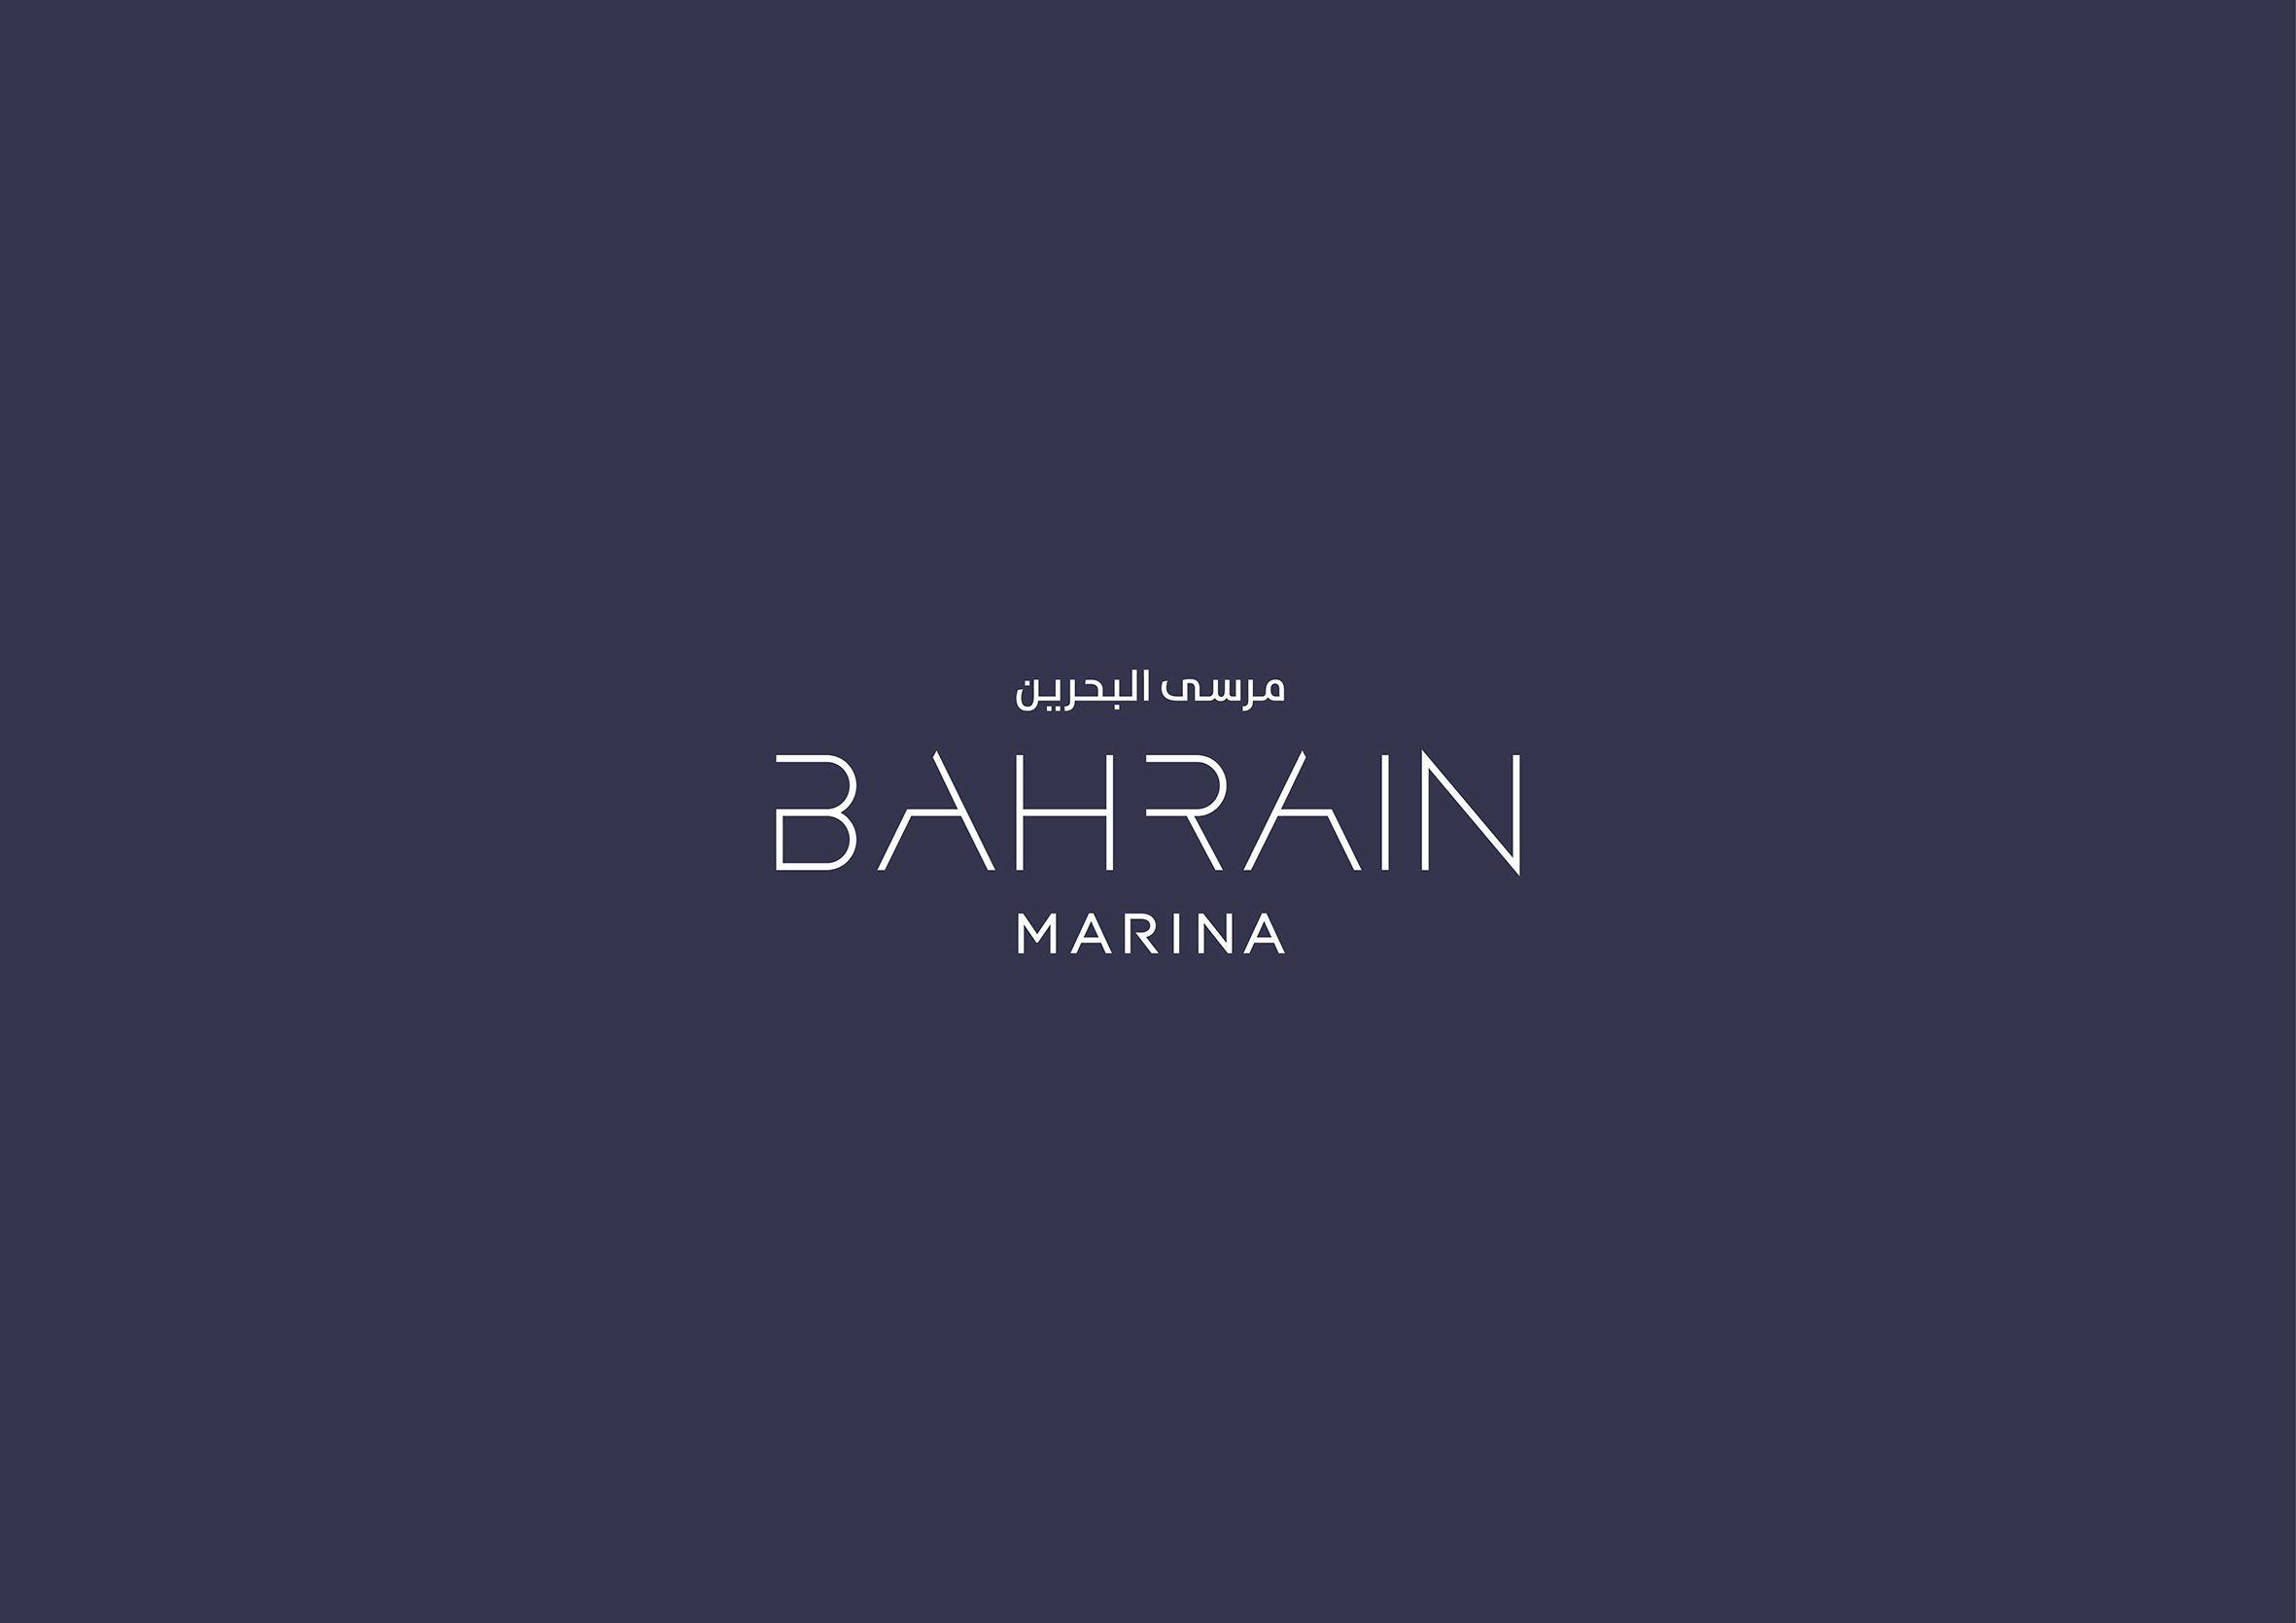 Bahrain-marina-identite-branding-logo.jpg